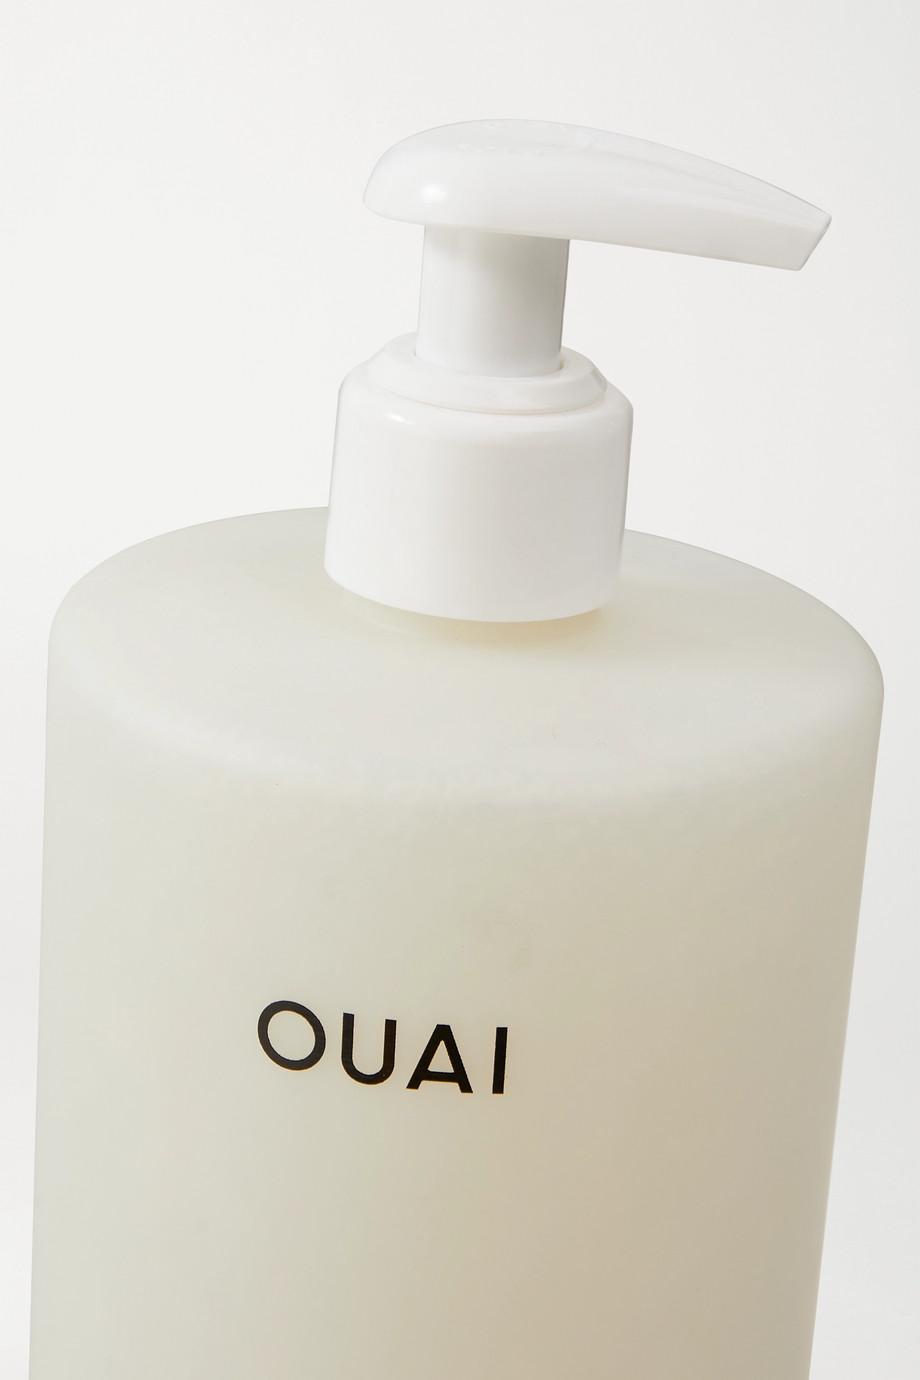 OUAI Haircare Hand Wash, 474ml